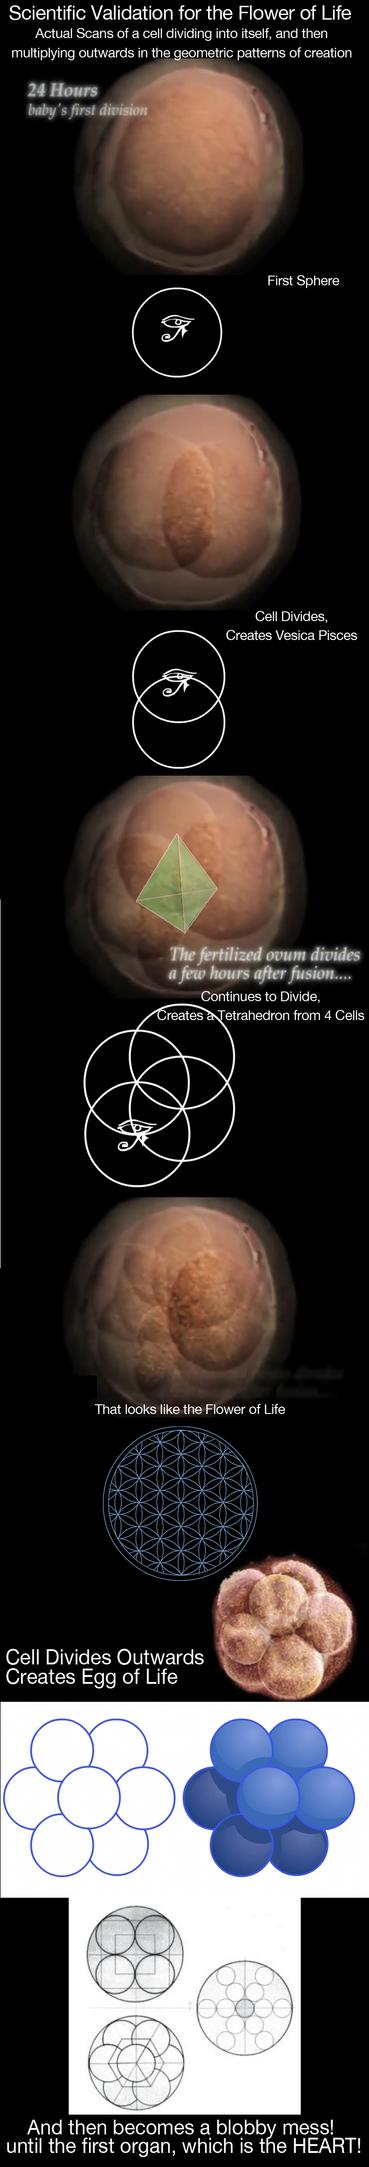 A Cells Transformation (FoL VALIDATION) by Duchednier